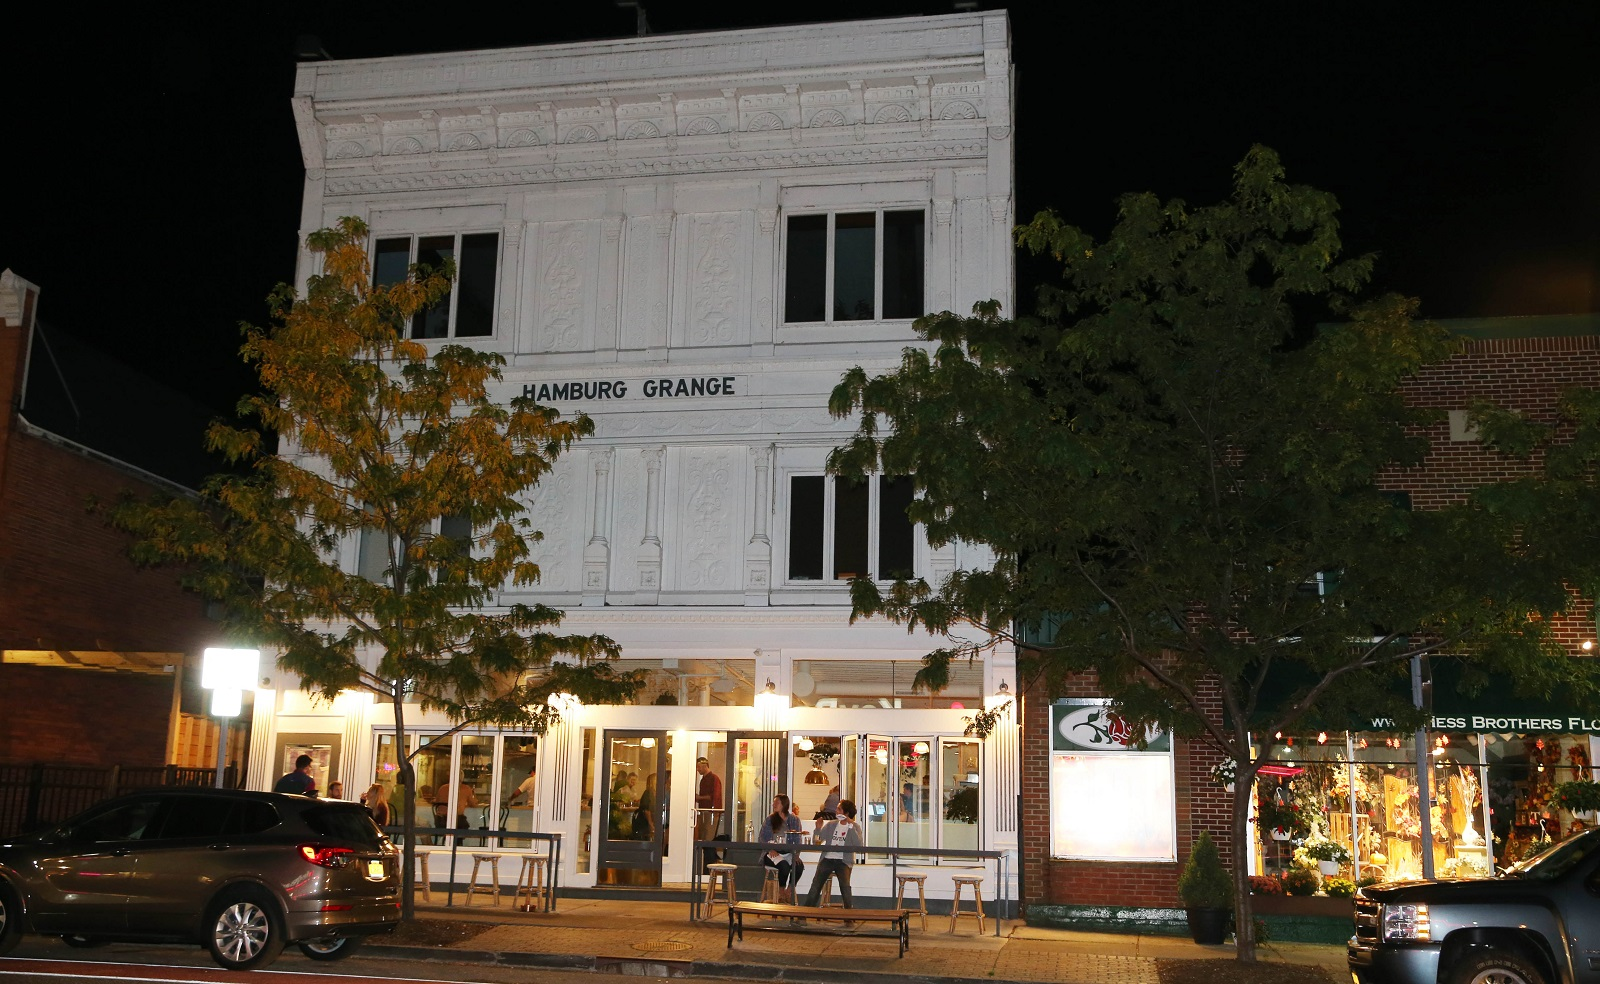 The Grange is a Hamburg restaurant opened by Brad Rowell, former chef at Elm Street Bakery. (Sharon Cantillon/Buffalo News)